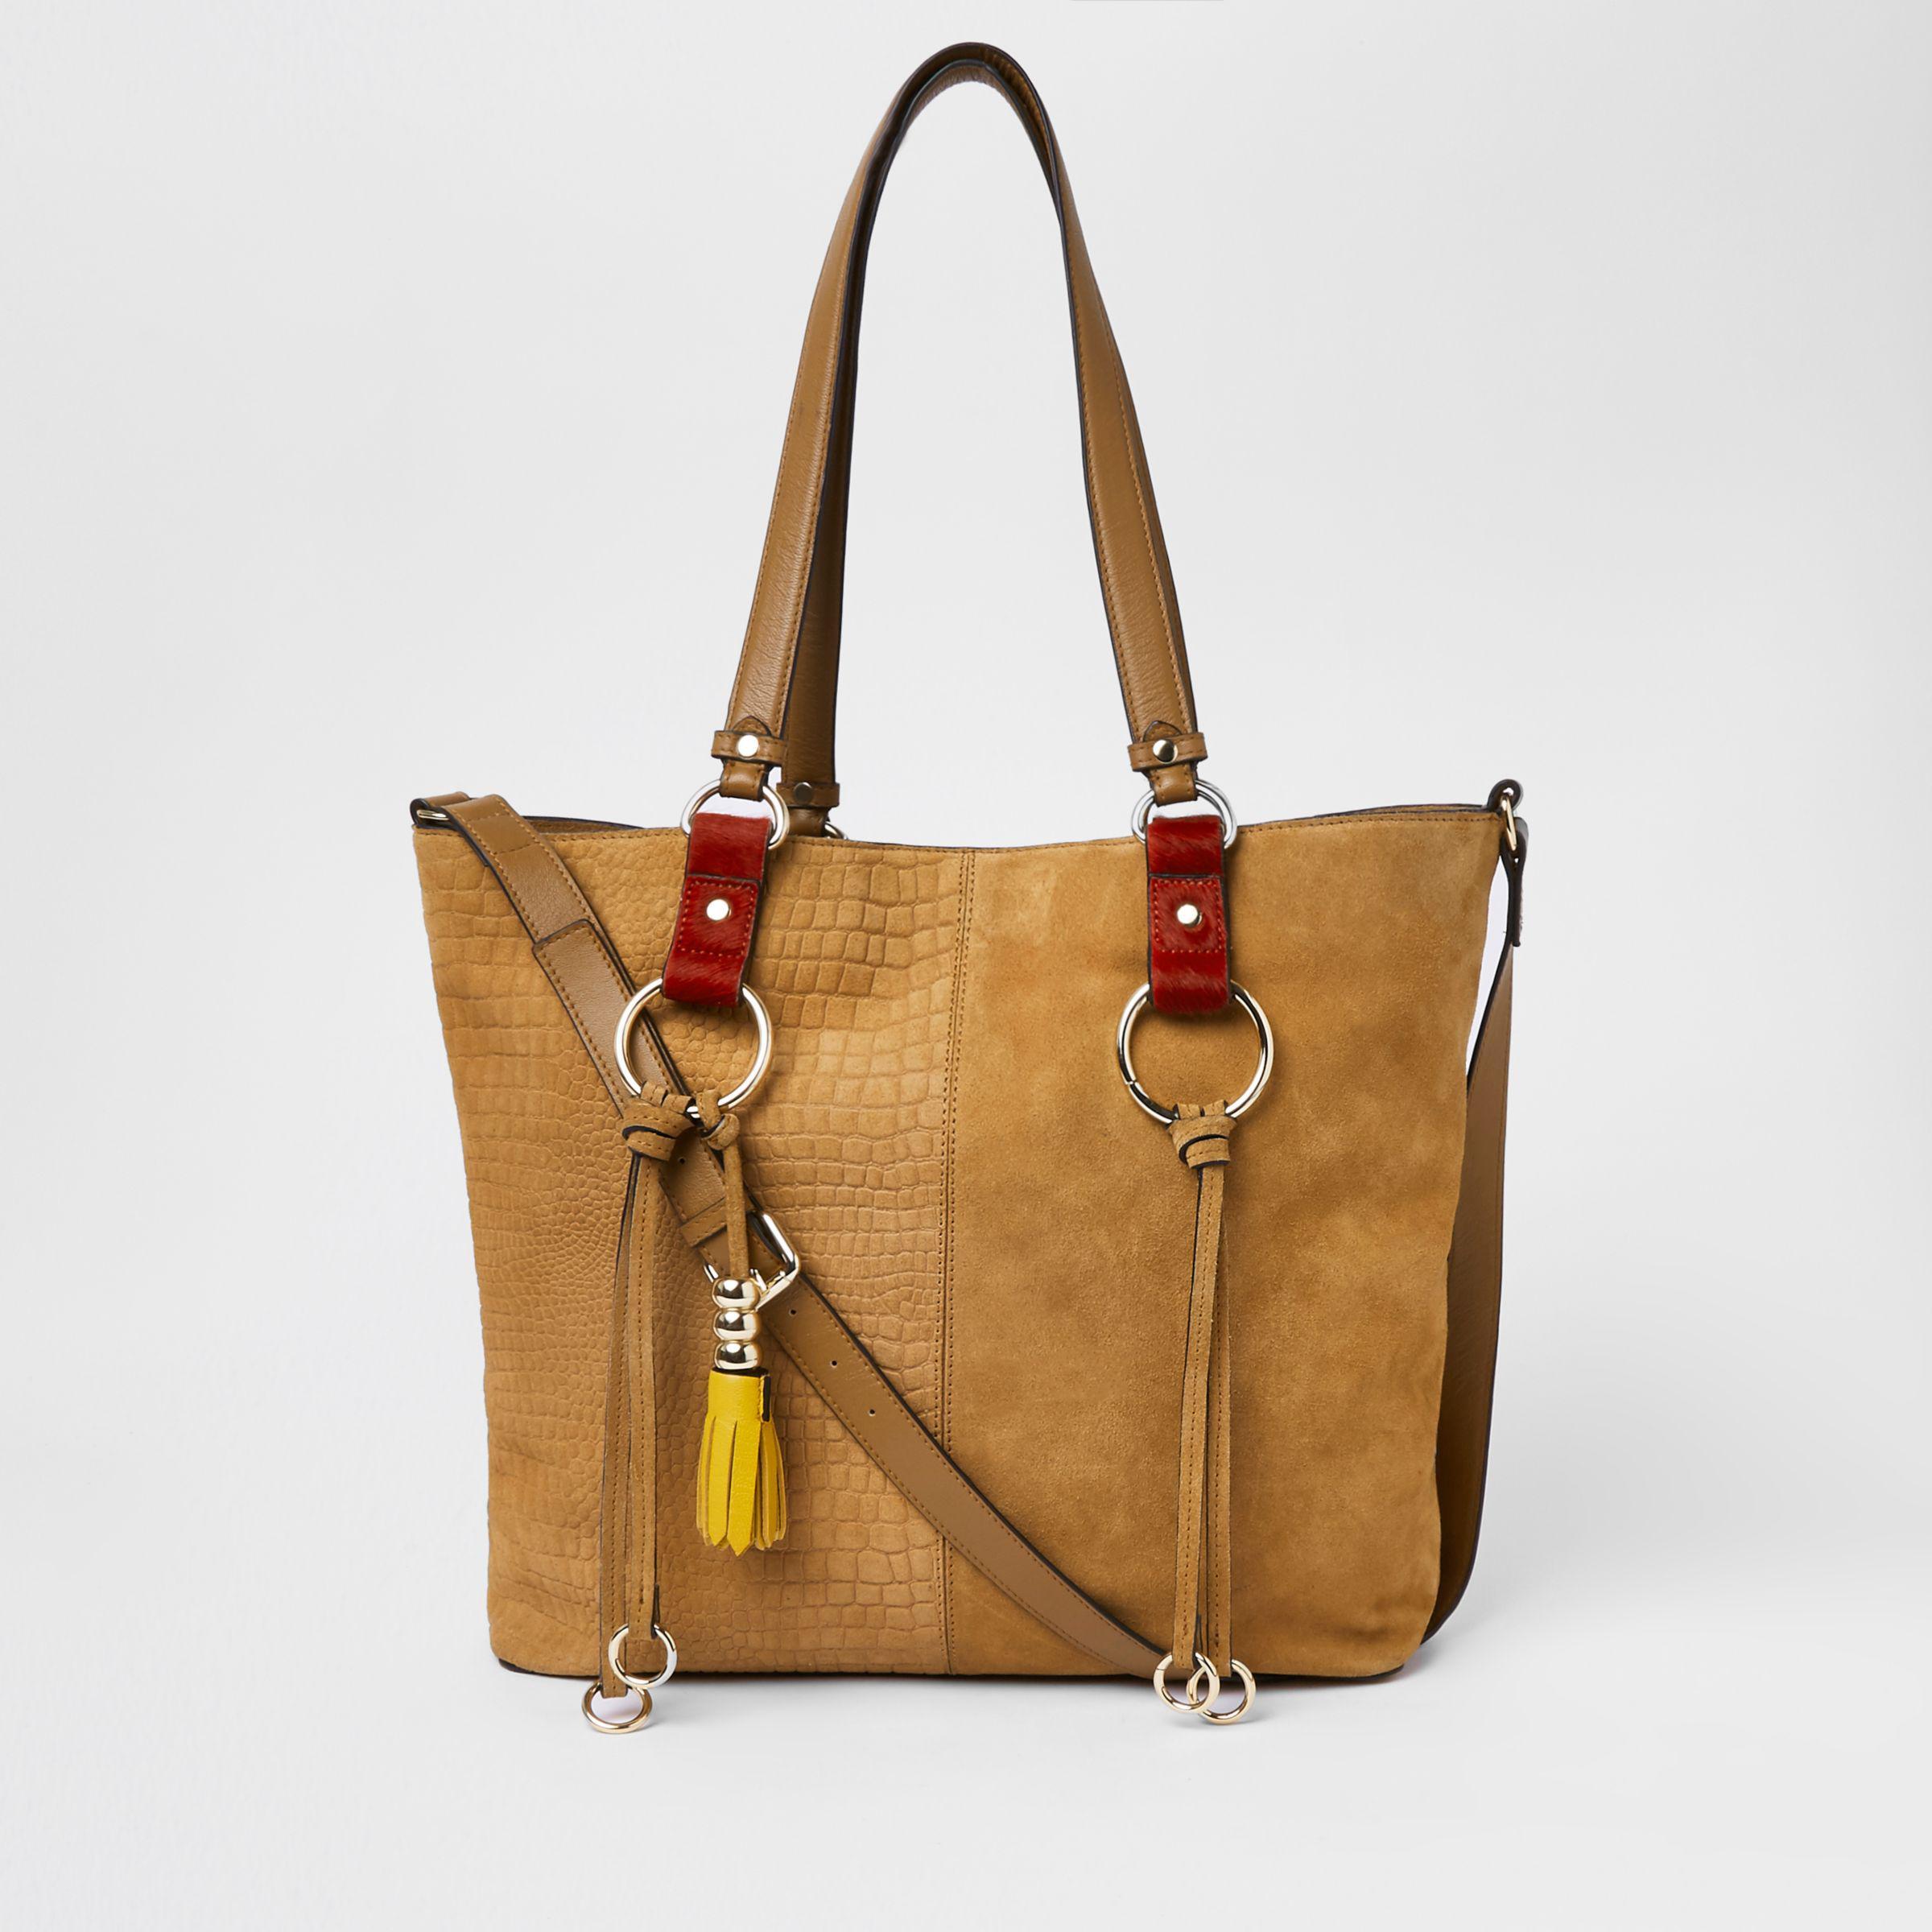 589ec8a51407 River Island Beige Suede Hoop Detail Shopper Bag in Natural - Lyst